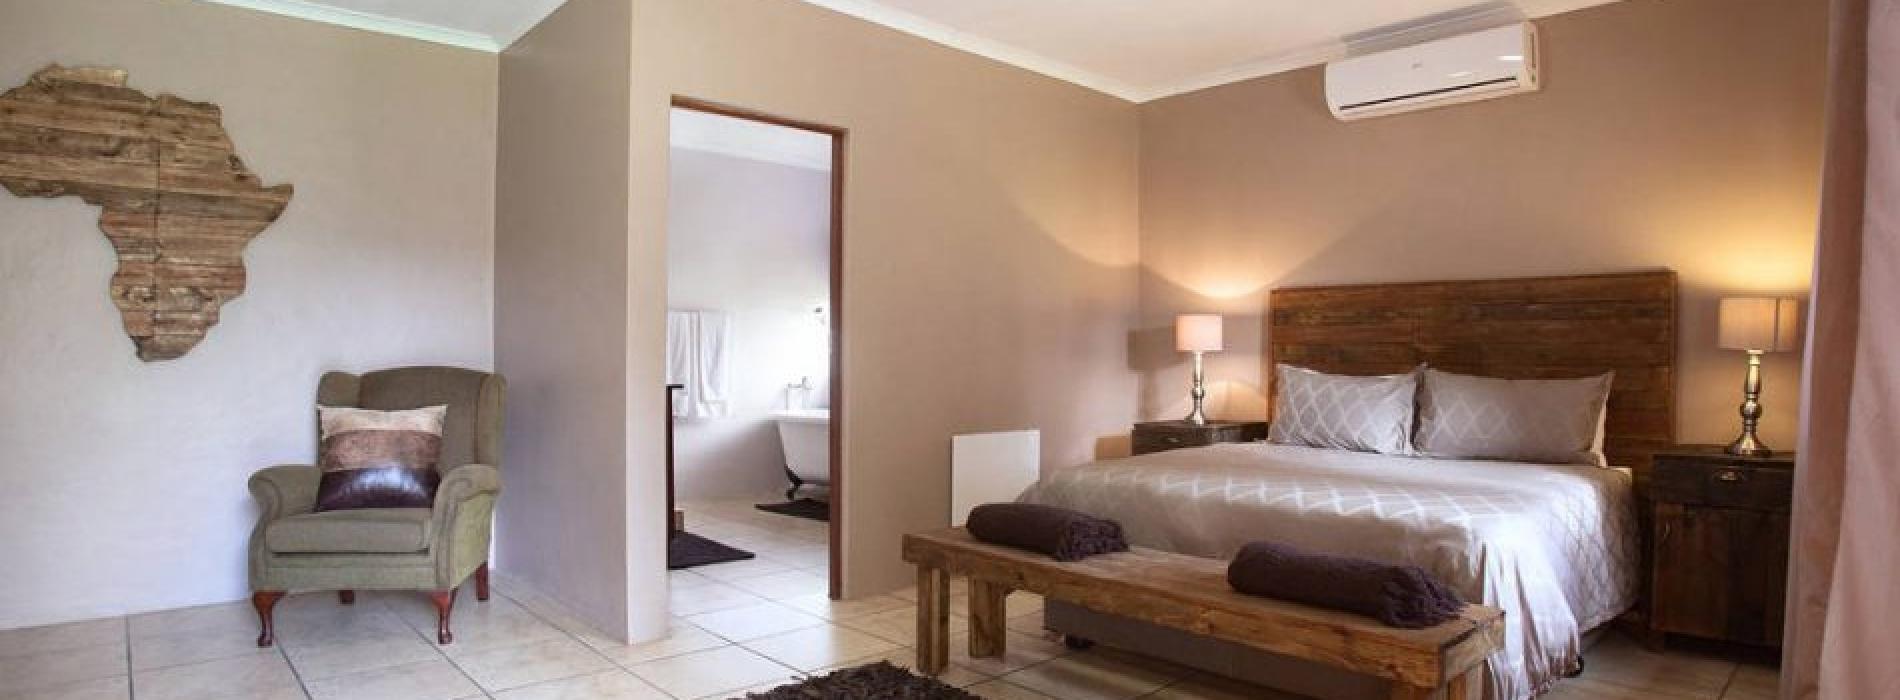 Brown Room Accommodation Option - Tambati Overnight Accommodation